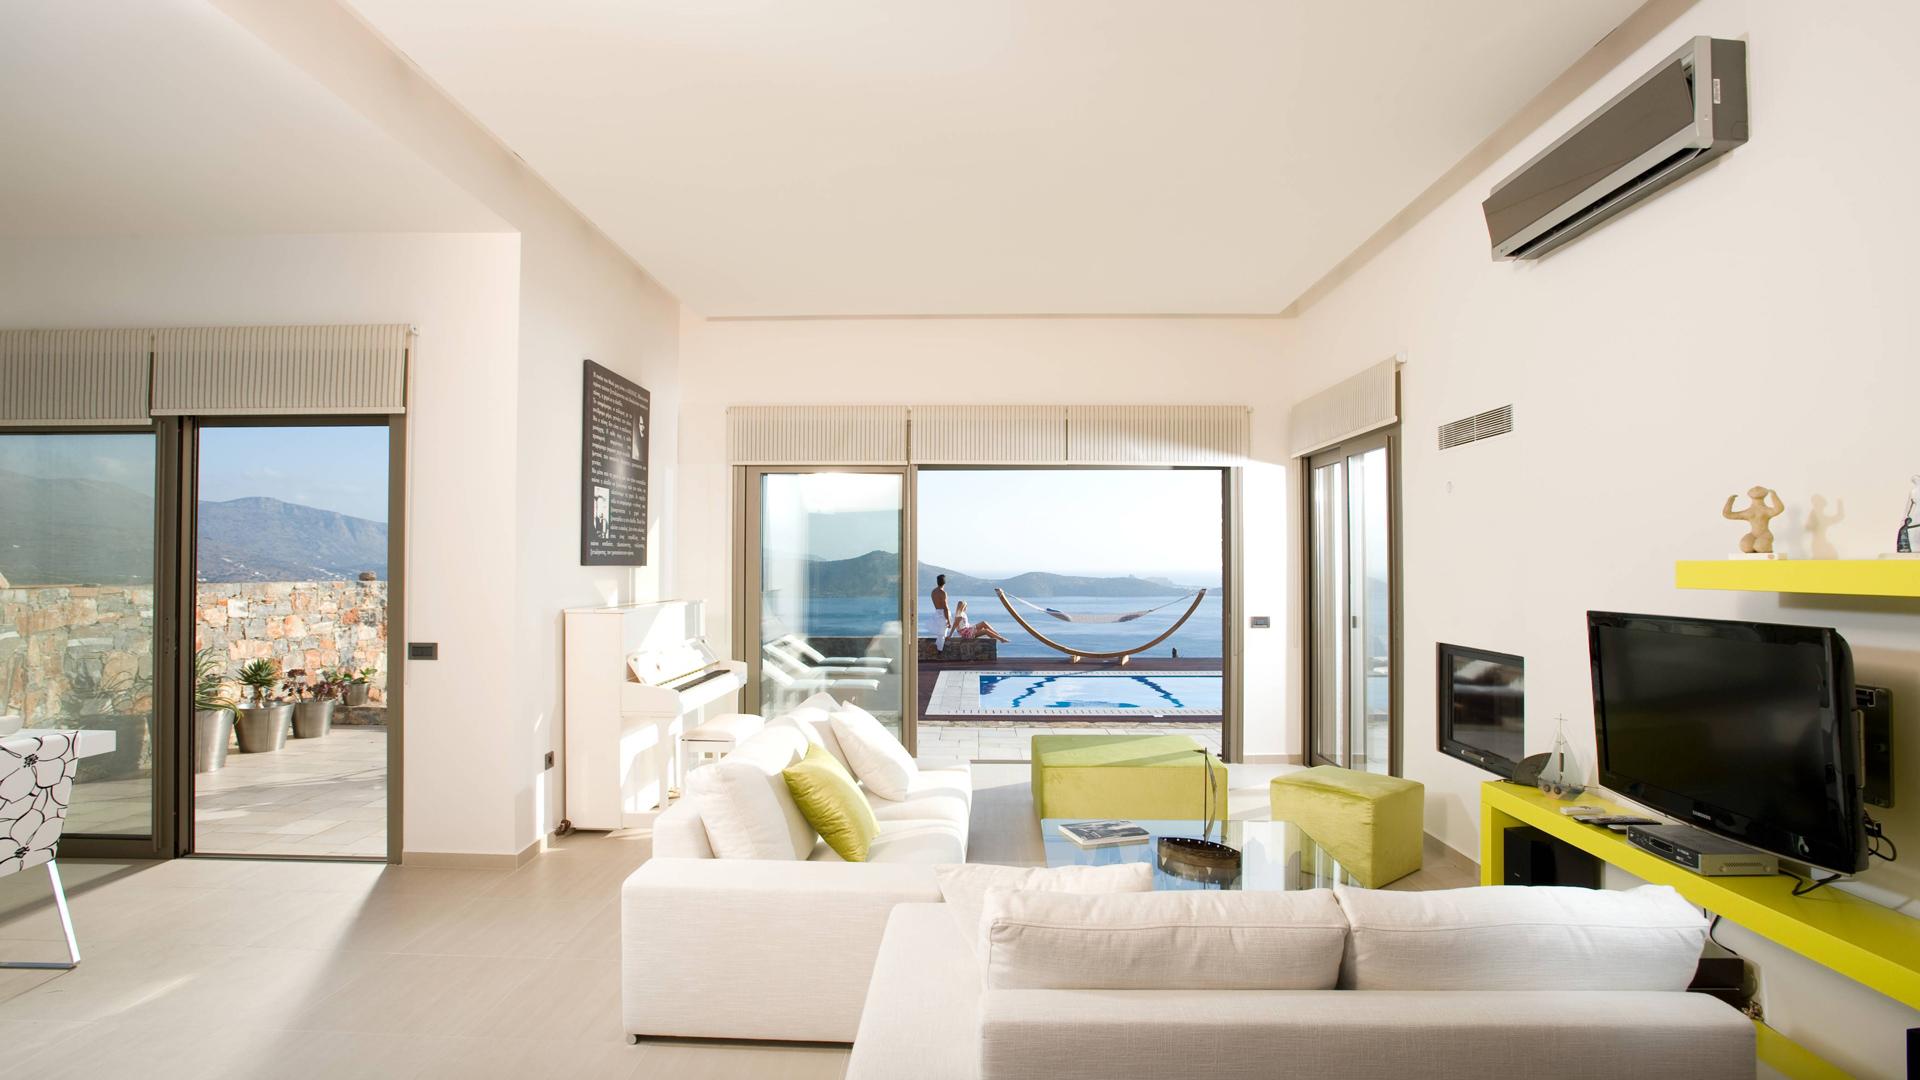 Grece location vacances villa crete elounda for Location maison de vacances de luxe